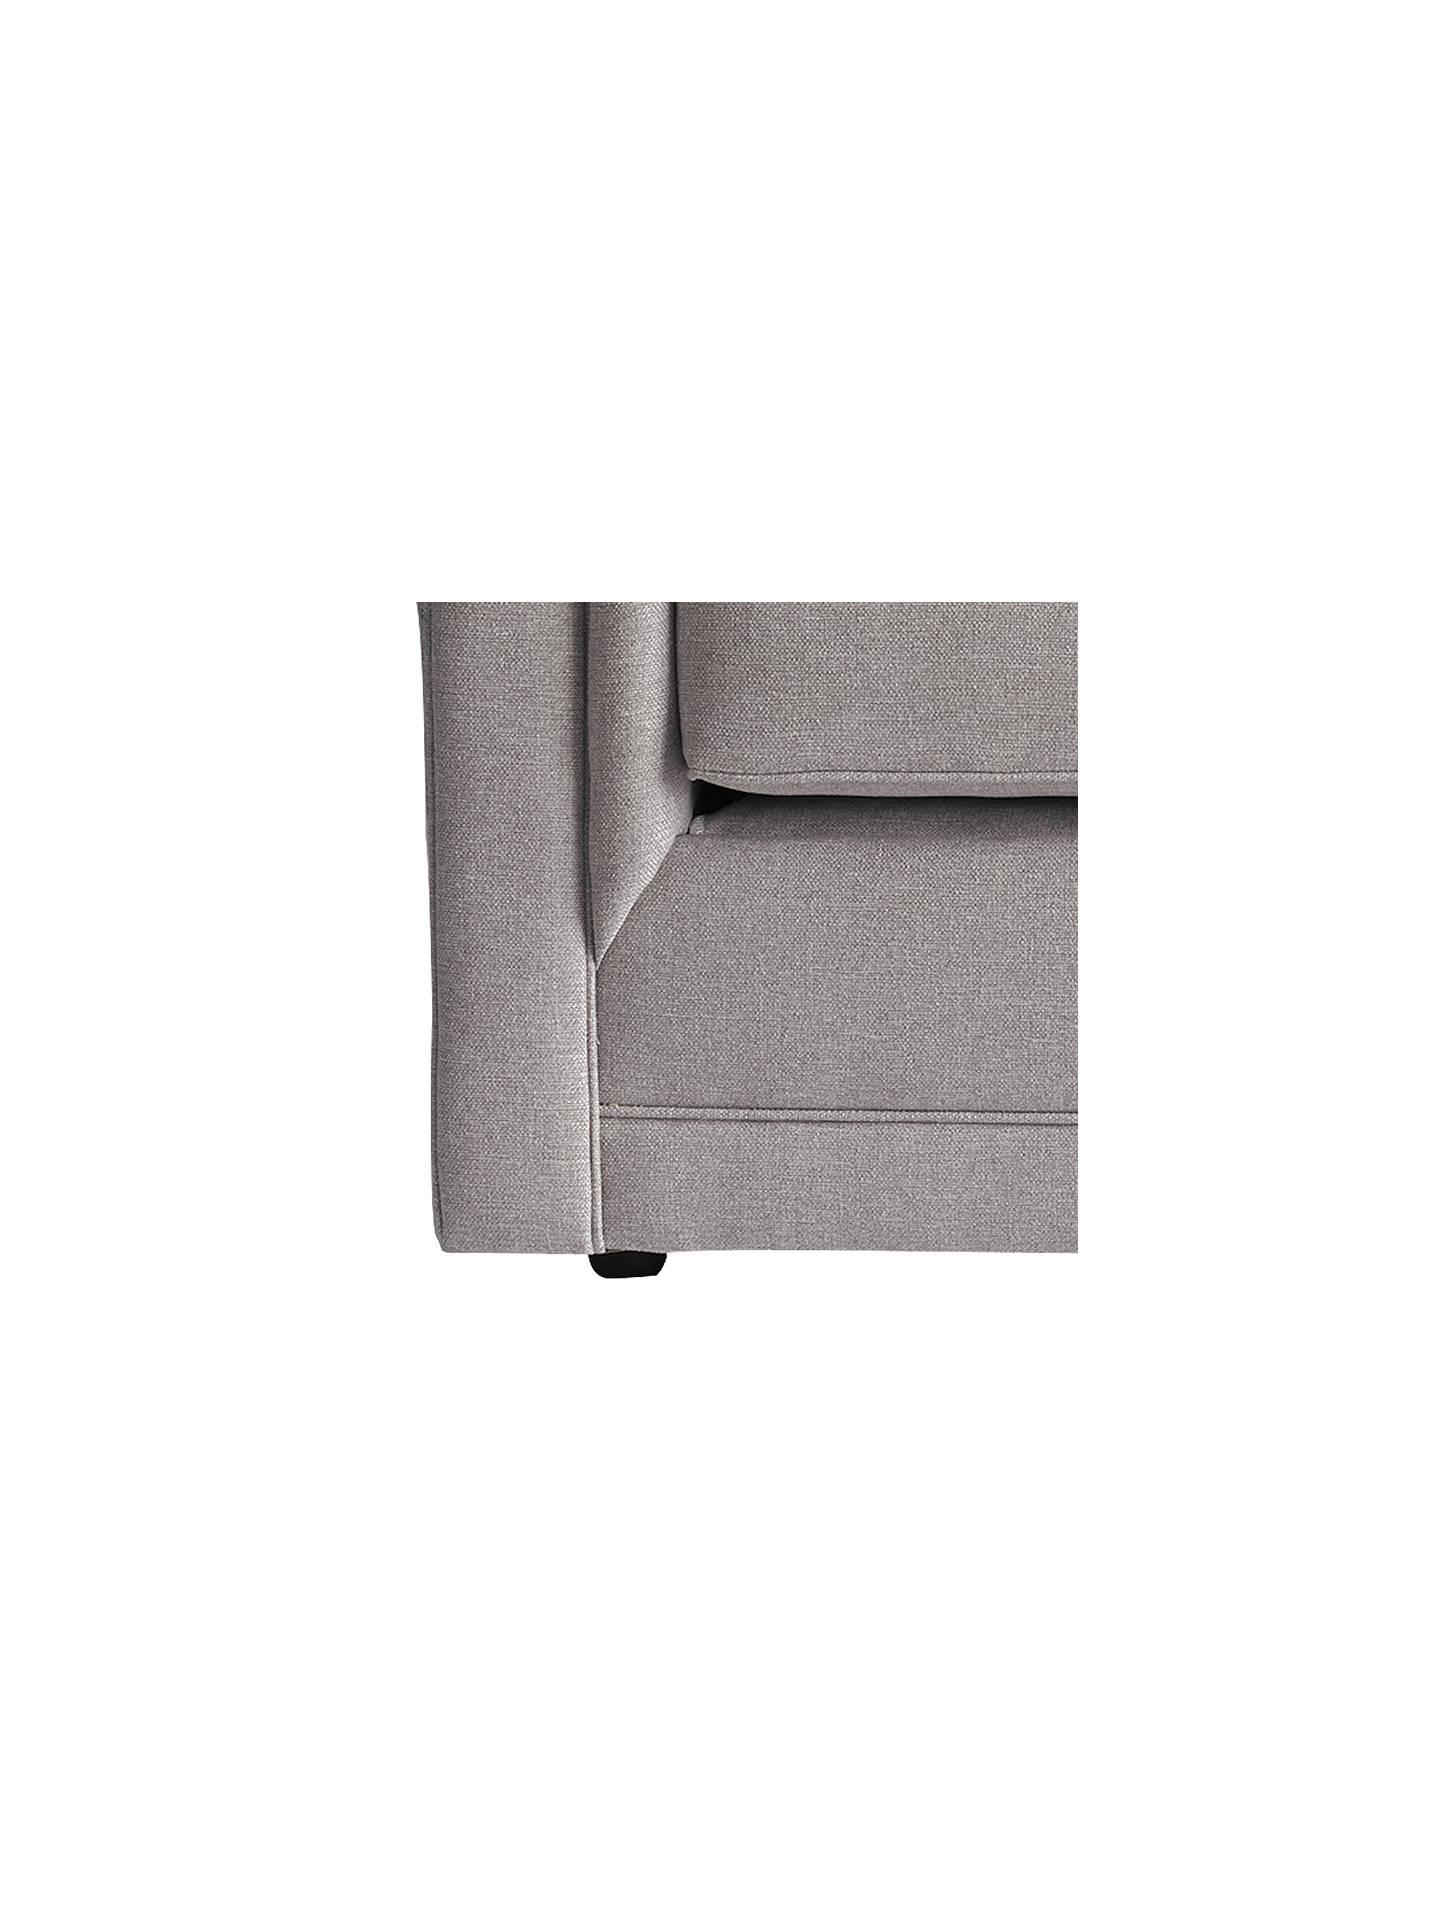 John Lewis Elgar Small Sofa Bed With Pocket Spring